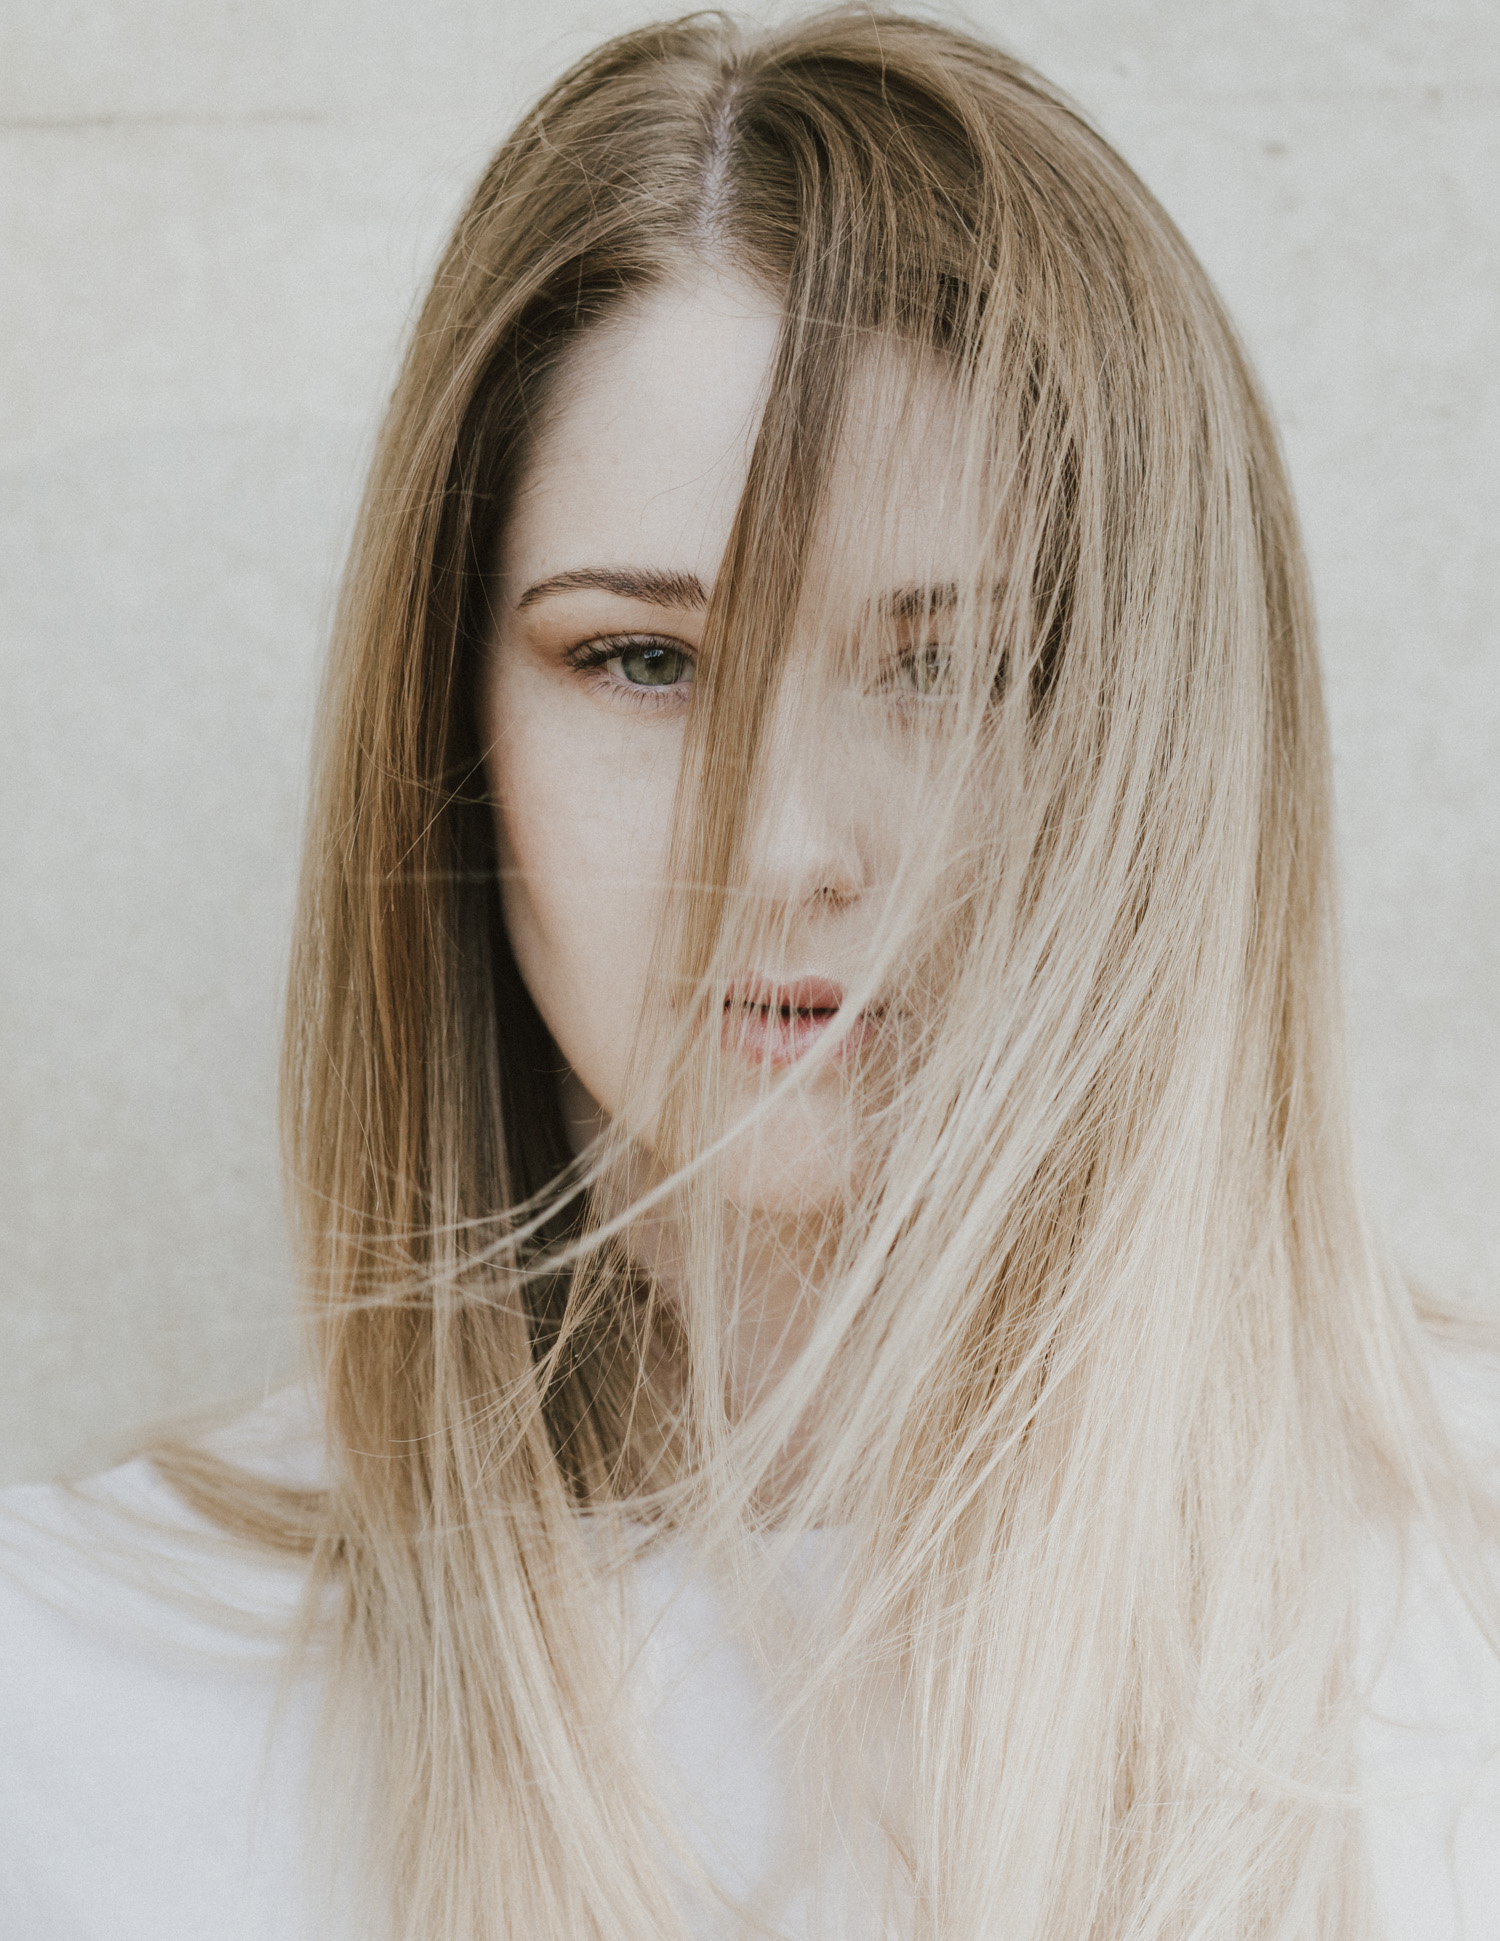 ANU portraits minimalist